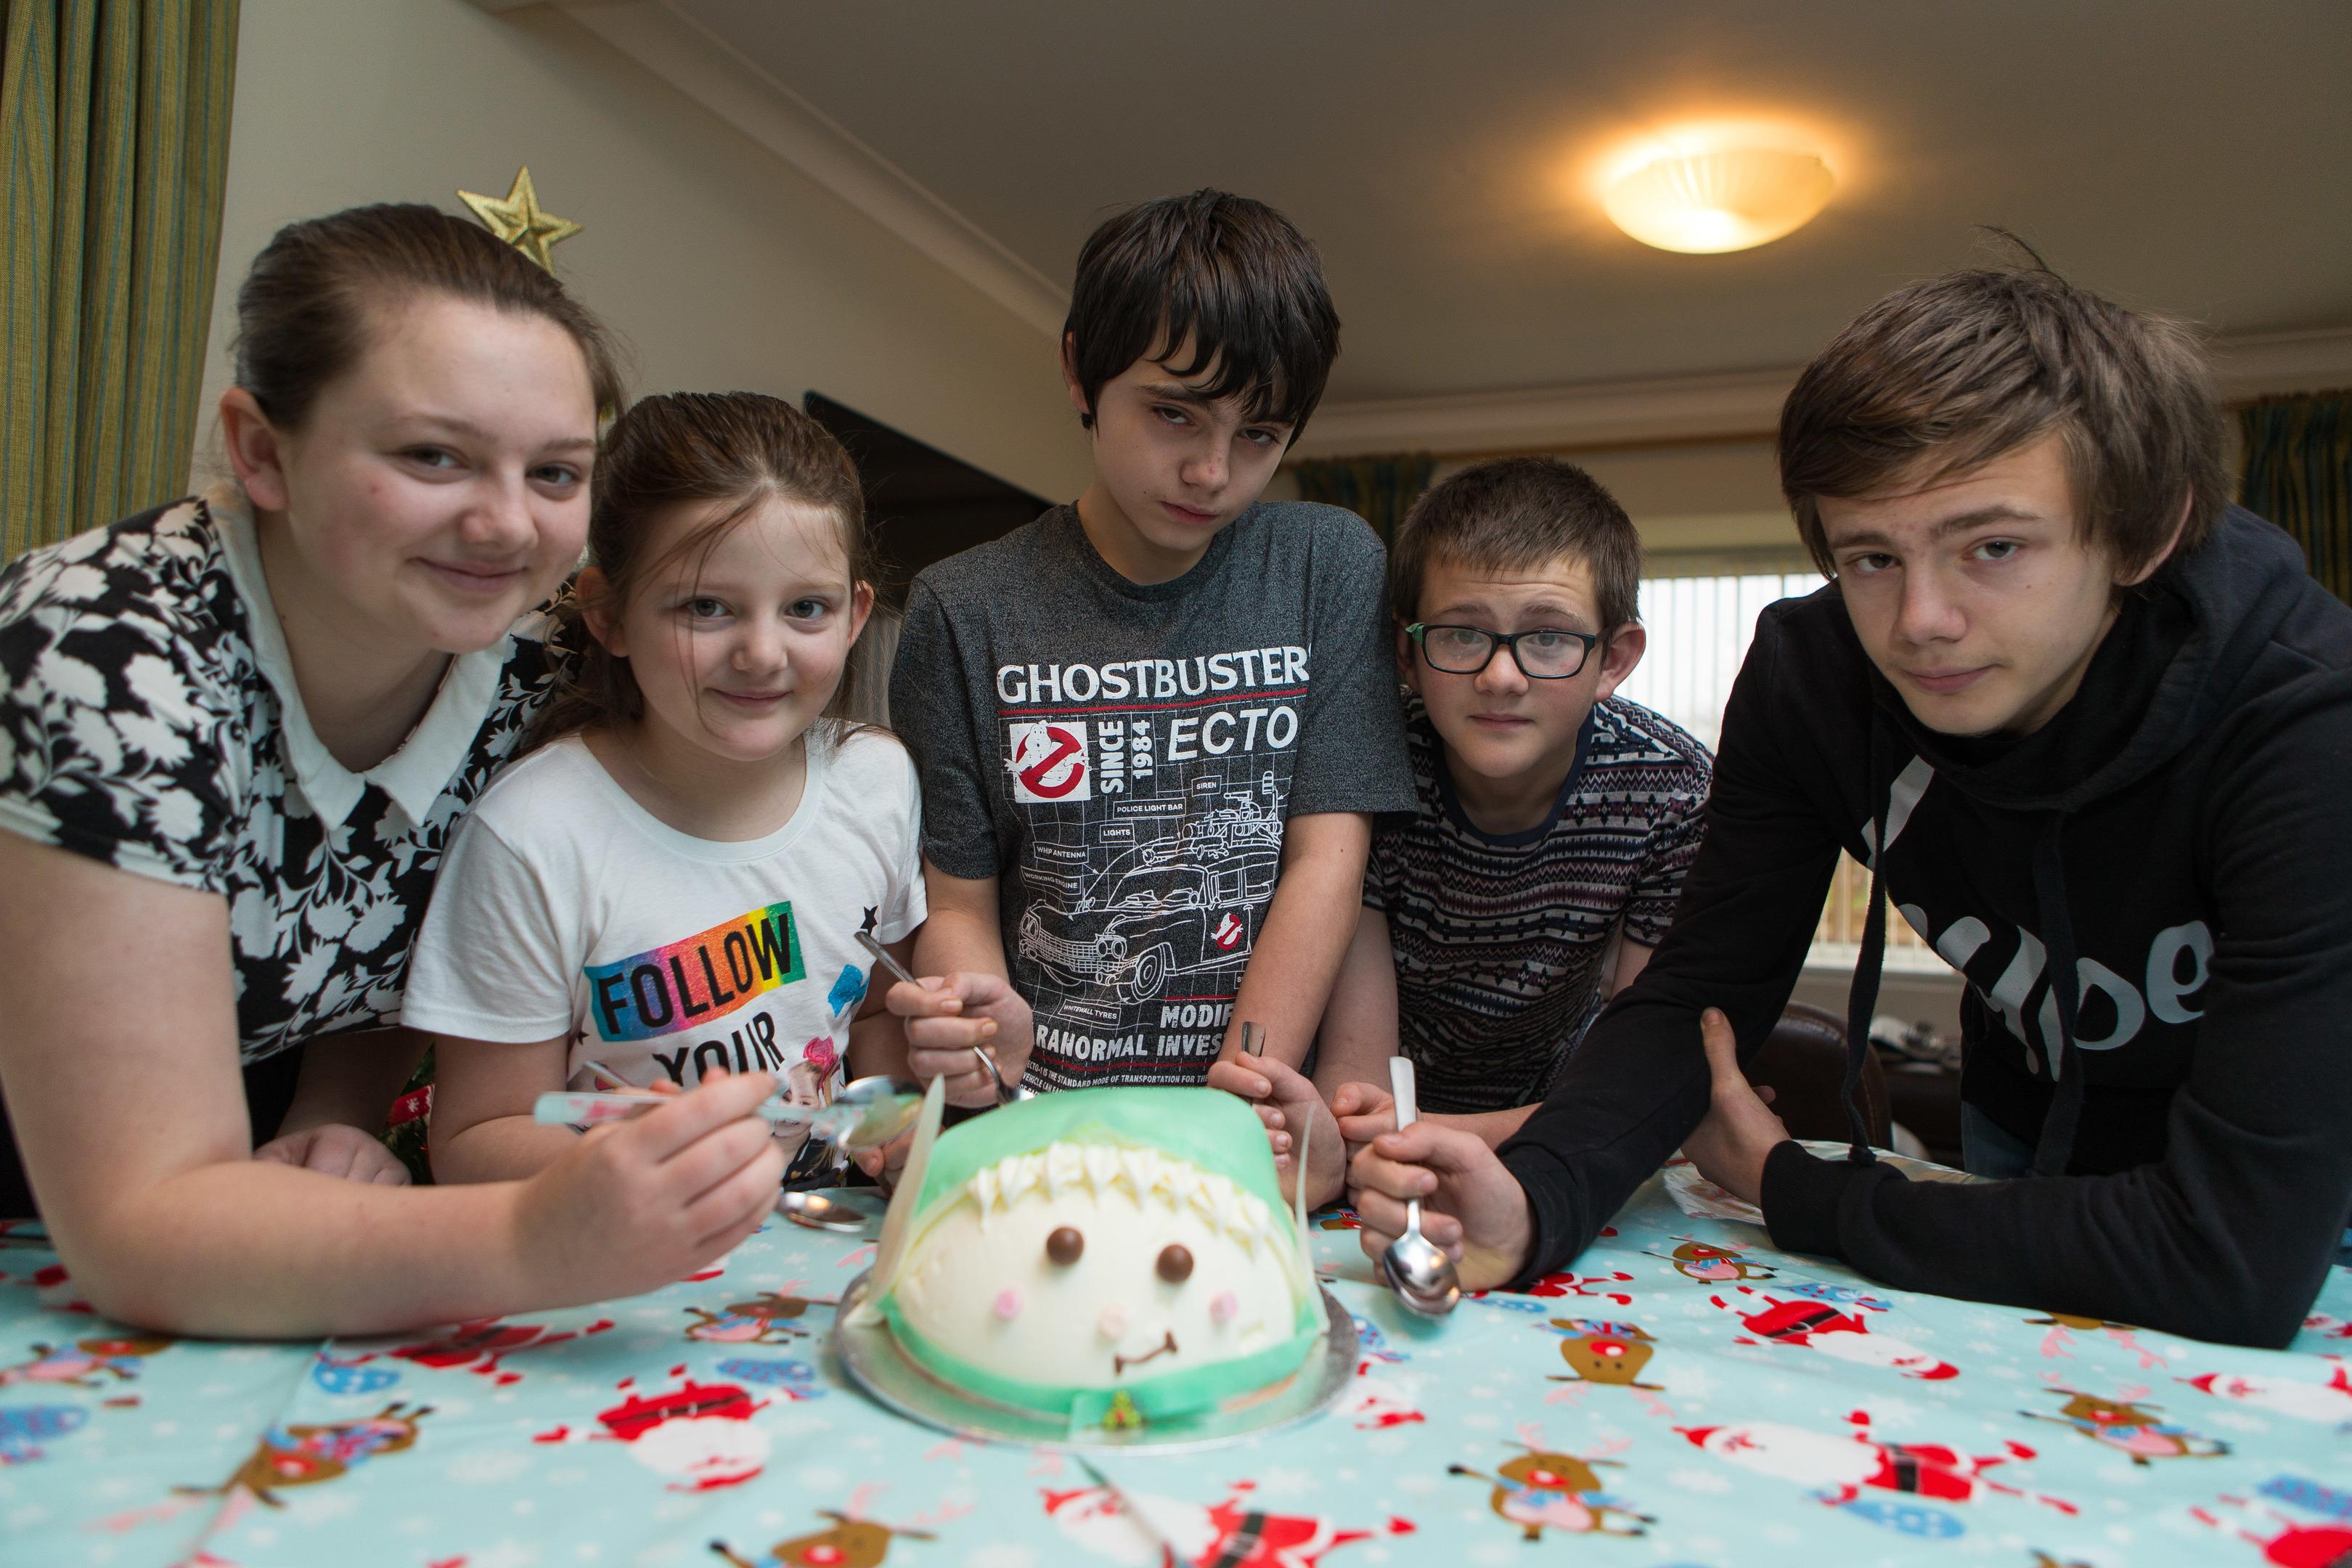 Fletcher family kids, Megan (16), Jodie (9), Ewan (12) , Ty (14) and John (15) try the Ice Cream Cake surprise